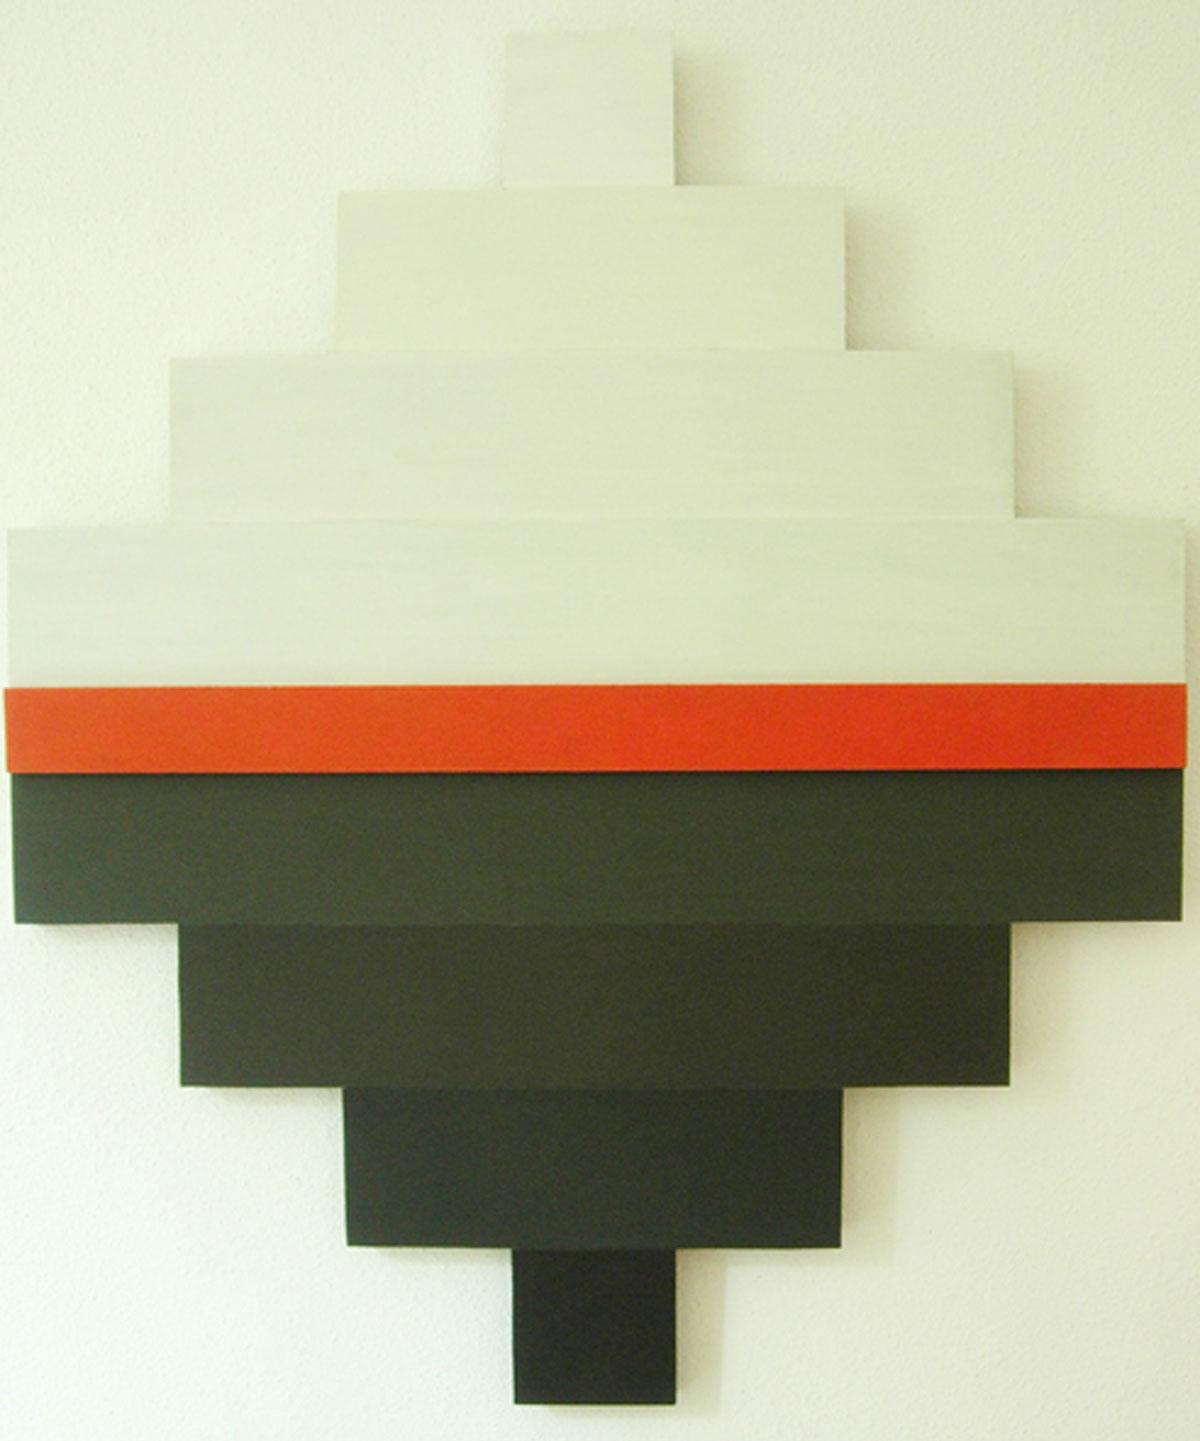 Igor Ganikowskij: Big Composition